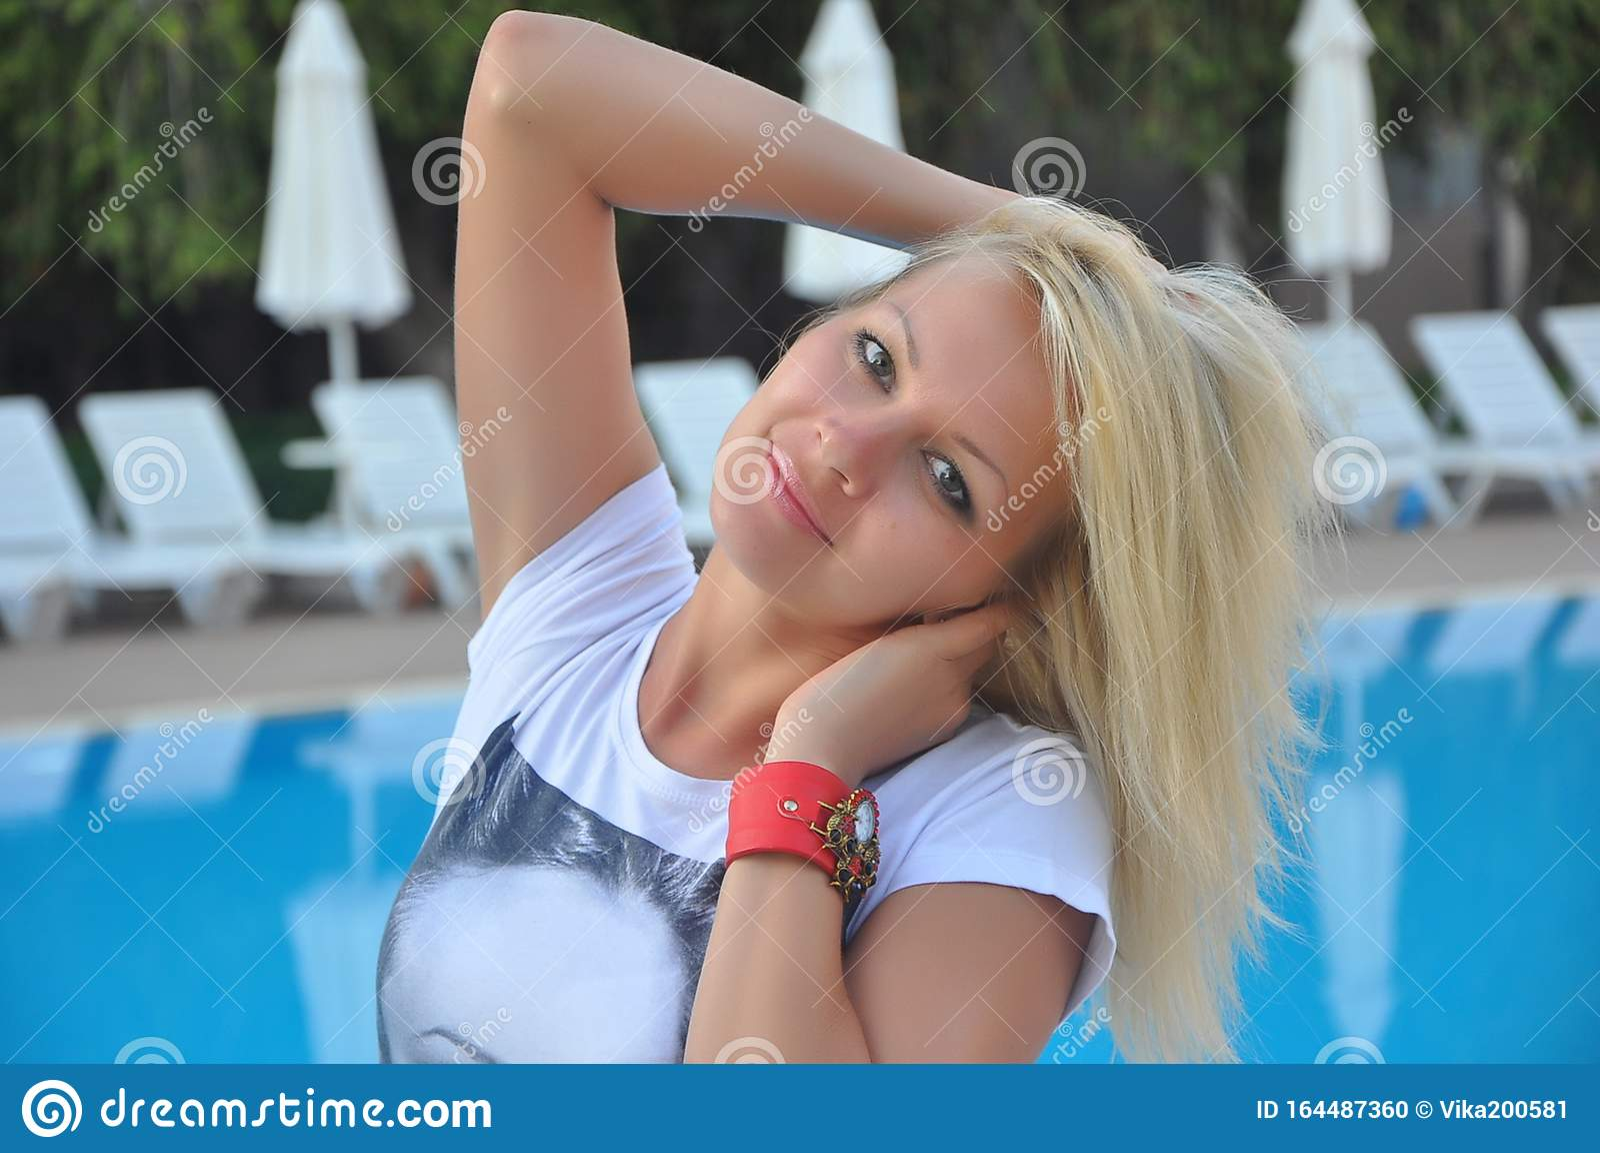 https://thumbs.dreamstime.com/z/portrait-beautiful-young-blonde-girl-classical-slavic-appearance-russian-beauty-slender-figure-beautiful-woman-164487360.jpg